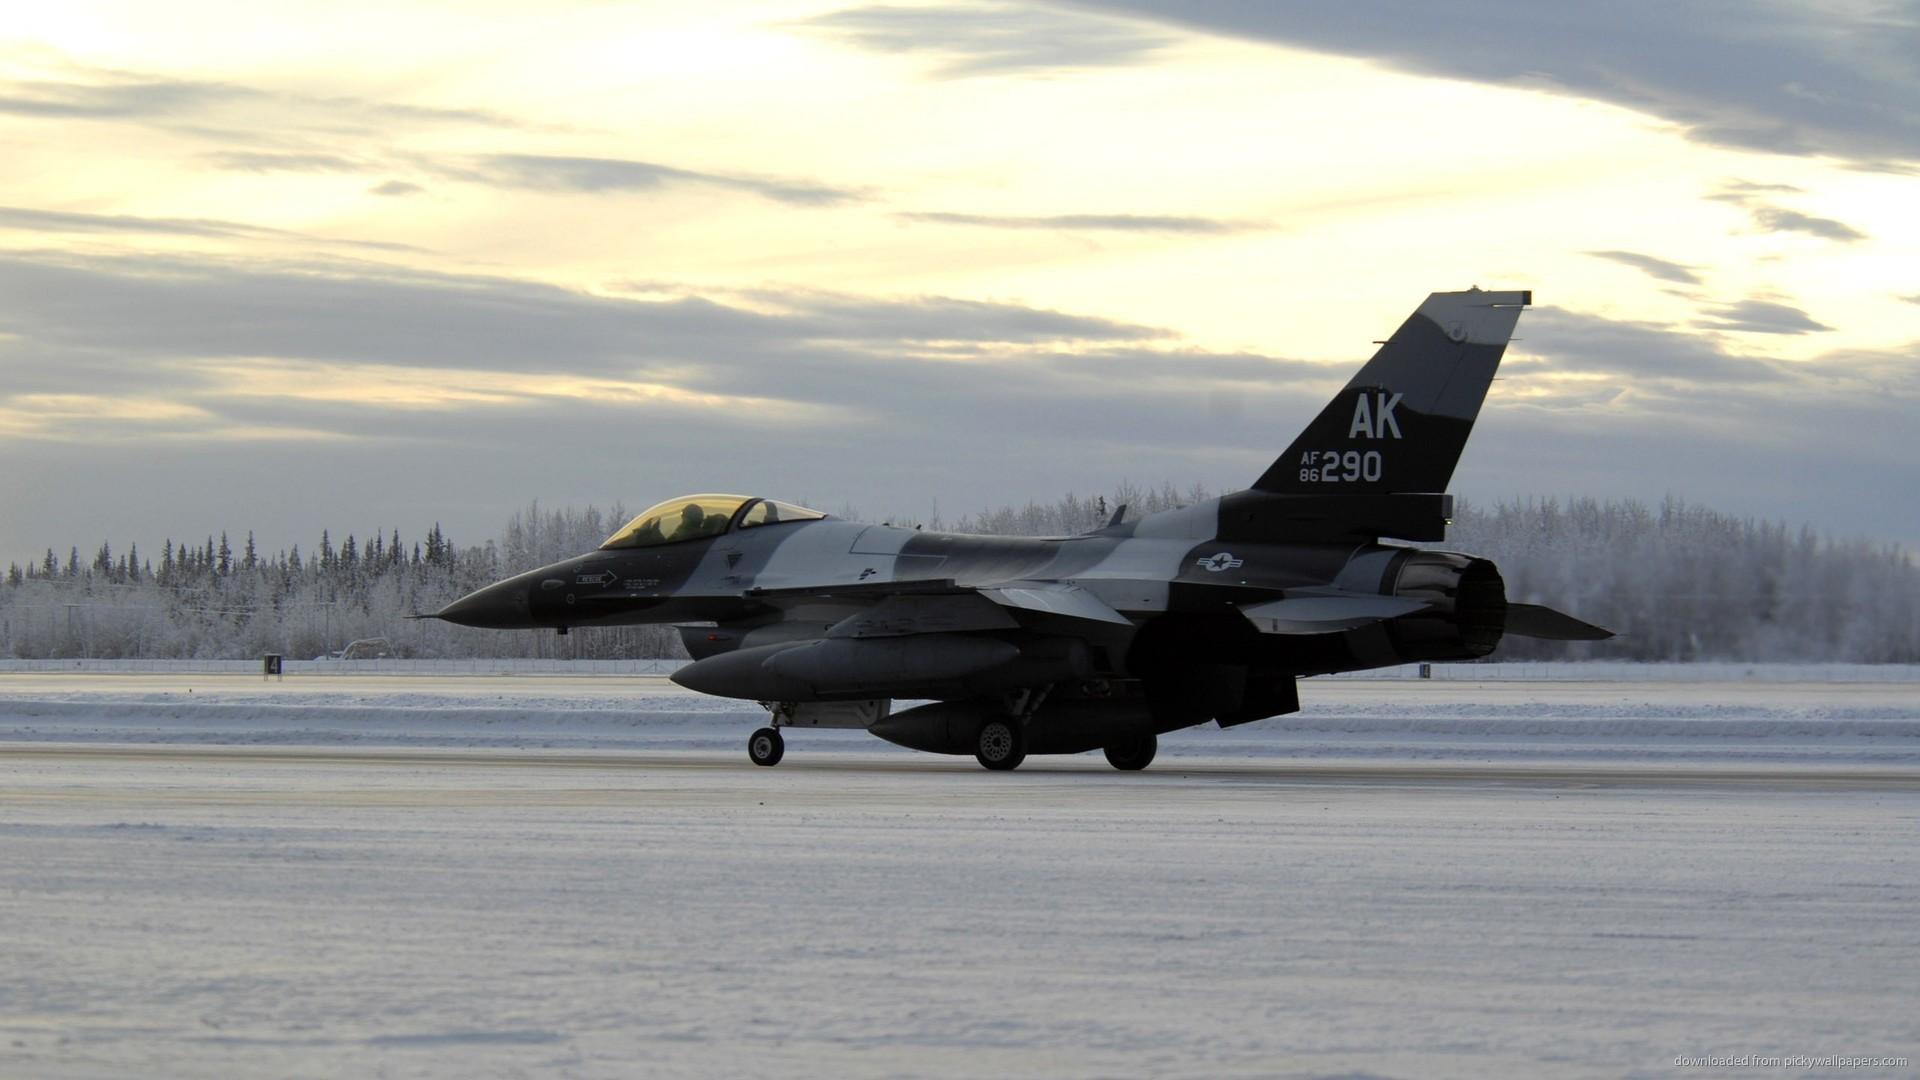 F-16 Fighting Falcon Winter Time picture